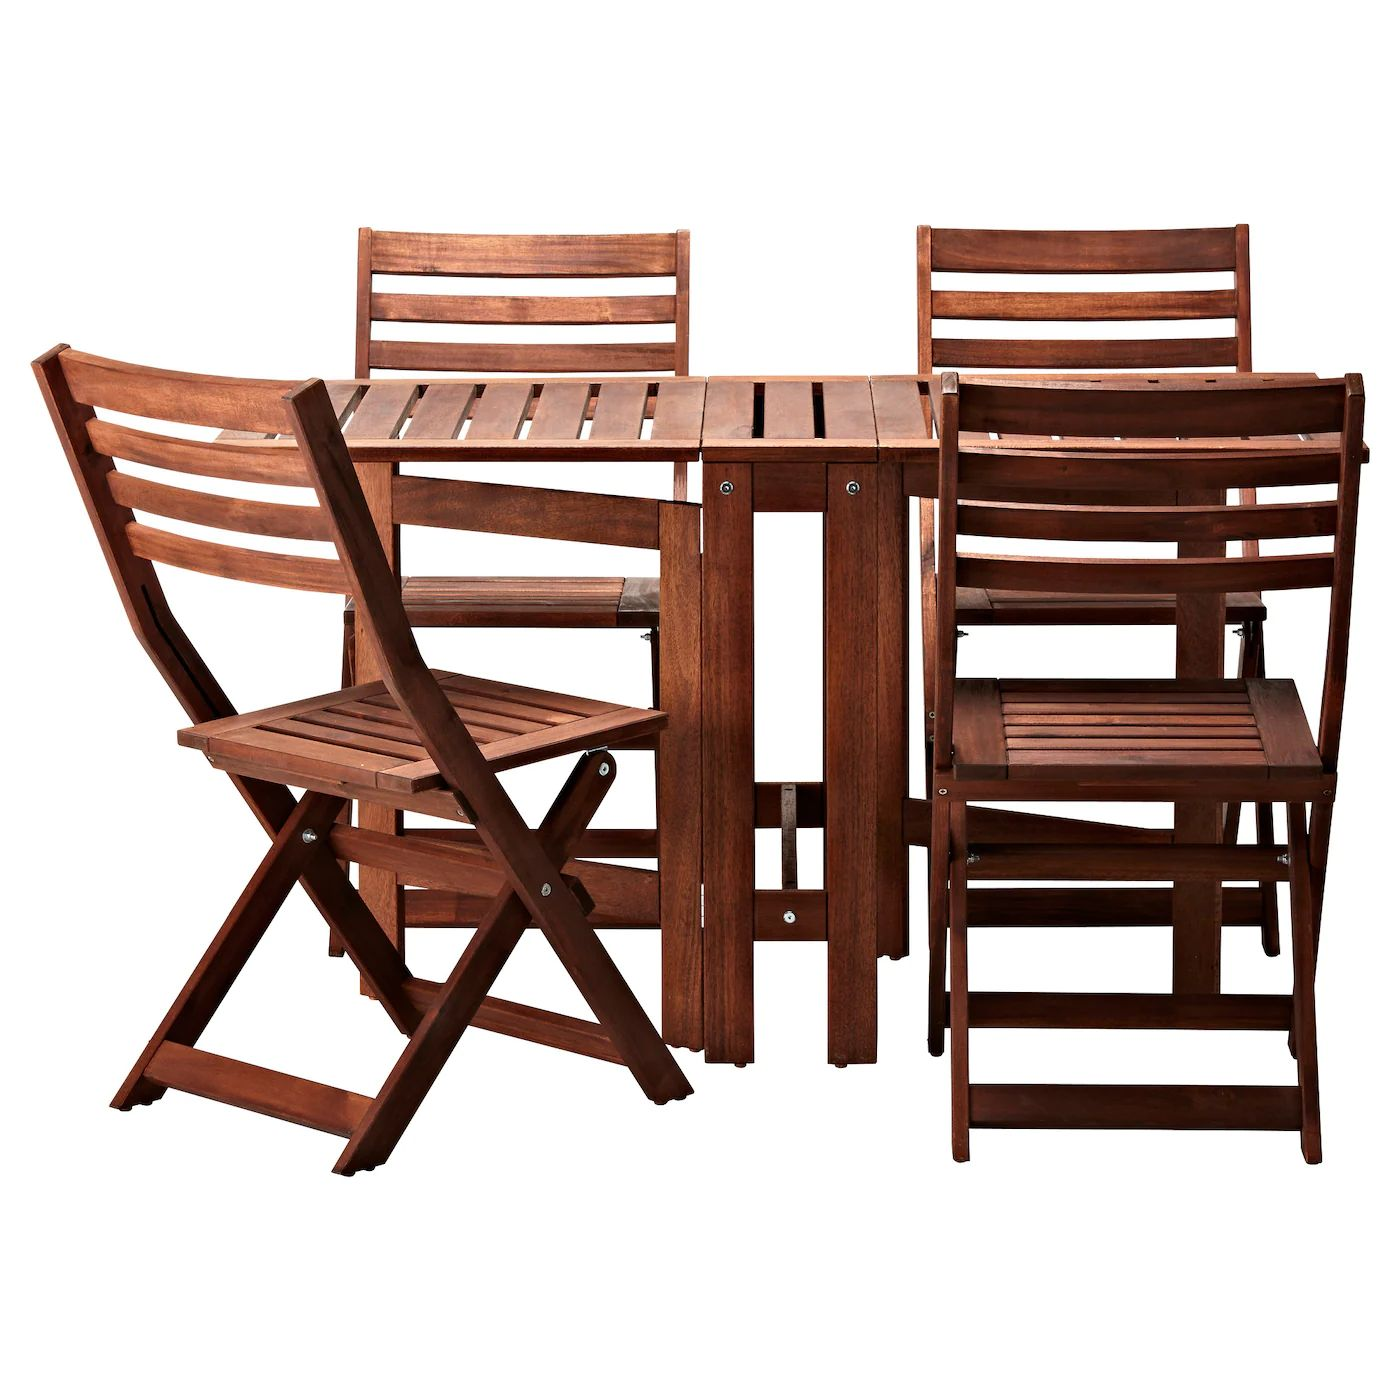 Ikea pplar table 4 folding chairs outdoor